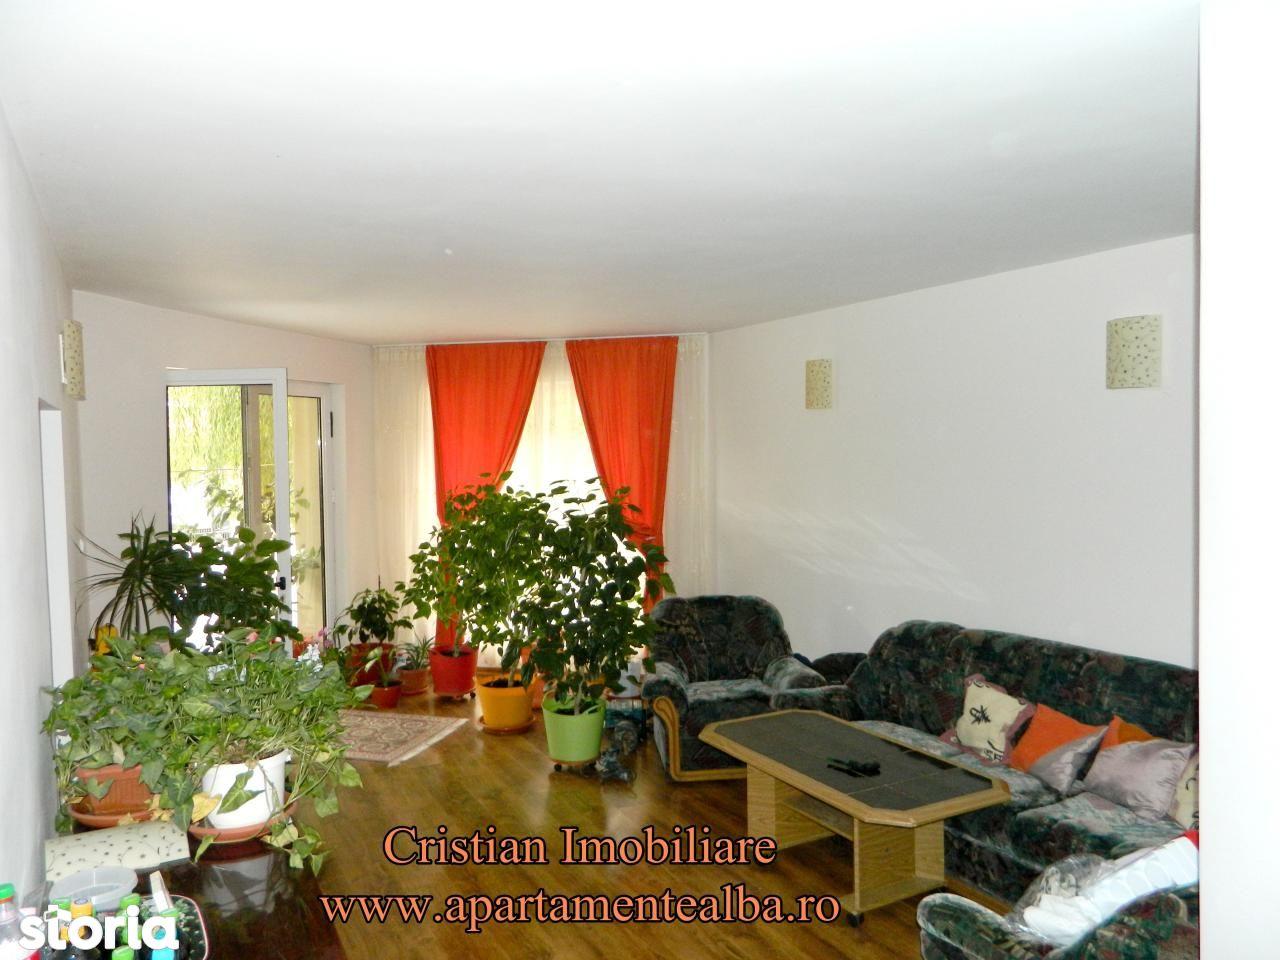 Casa de vanzare, Alba Iulia, Alba, Cetate - Foto 12